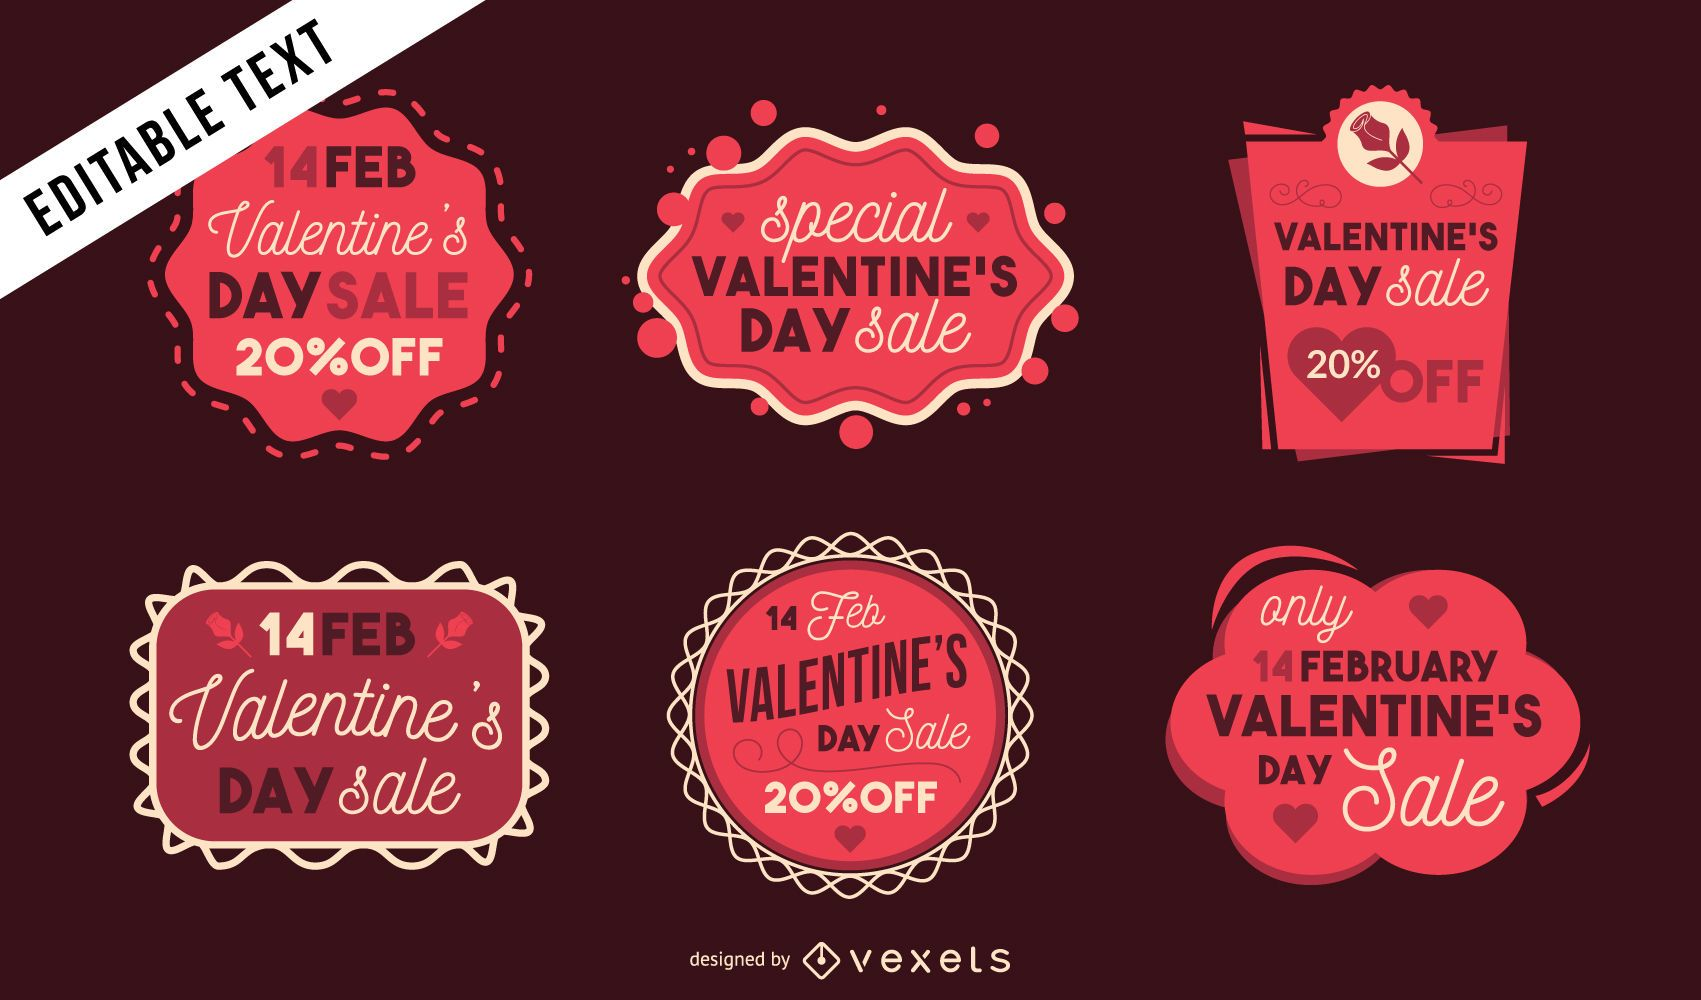 Valentine's Day sale stickers set